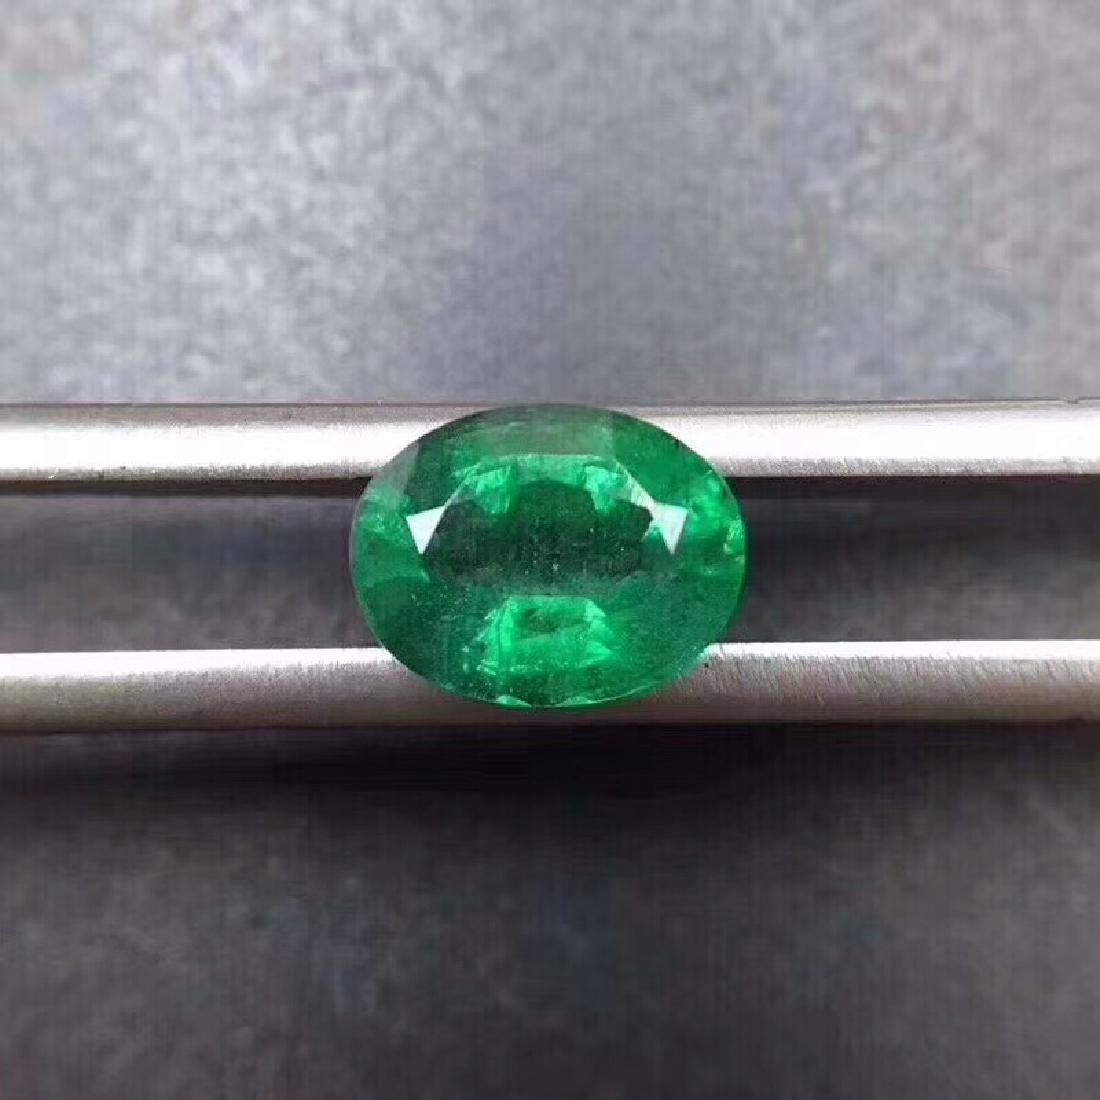 1.3 ct Emerald 7.9*4.2*6.0 mm Oval Cut